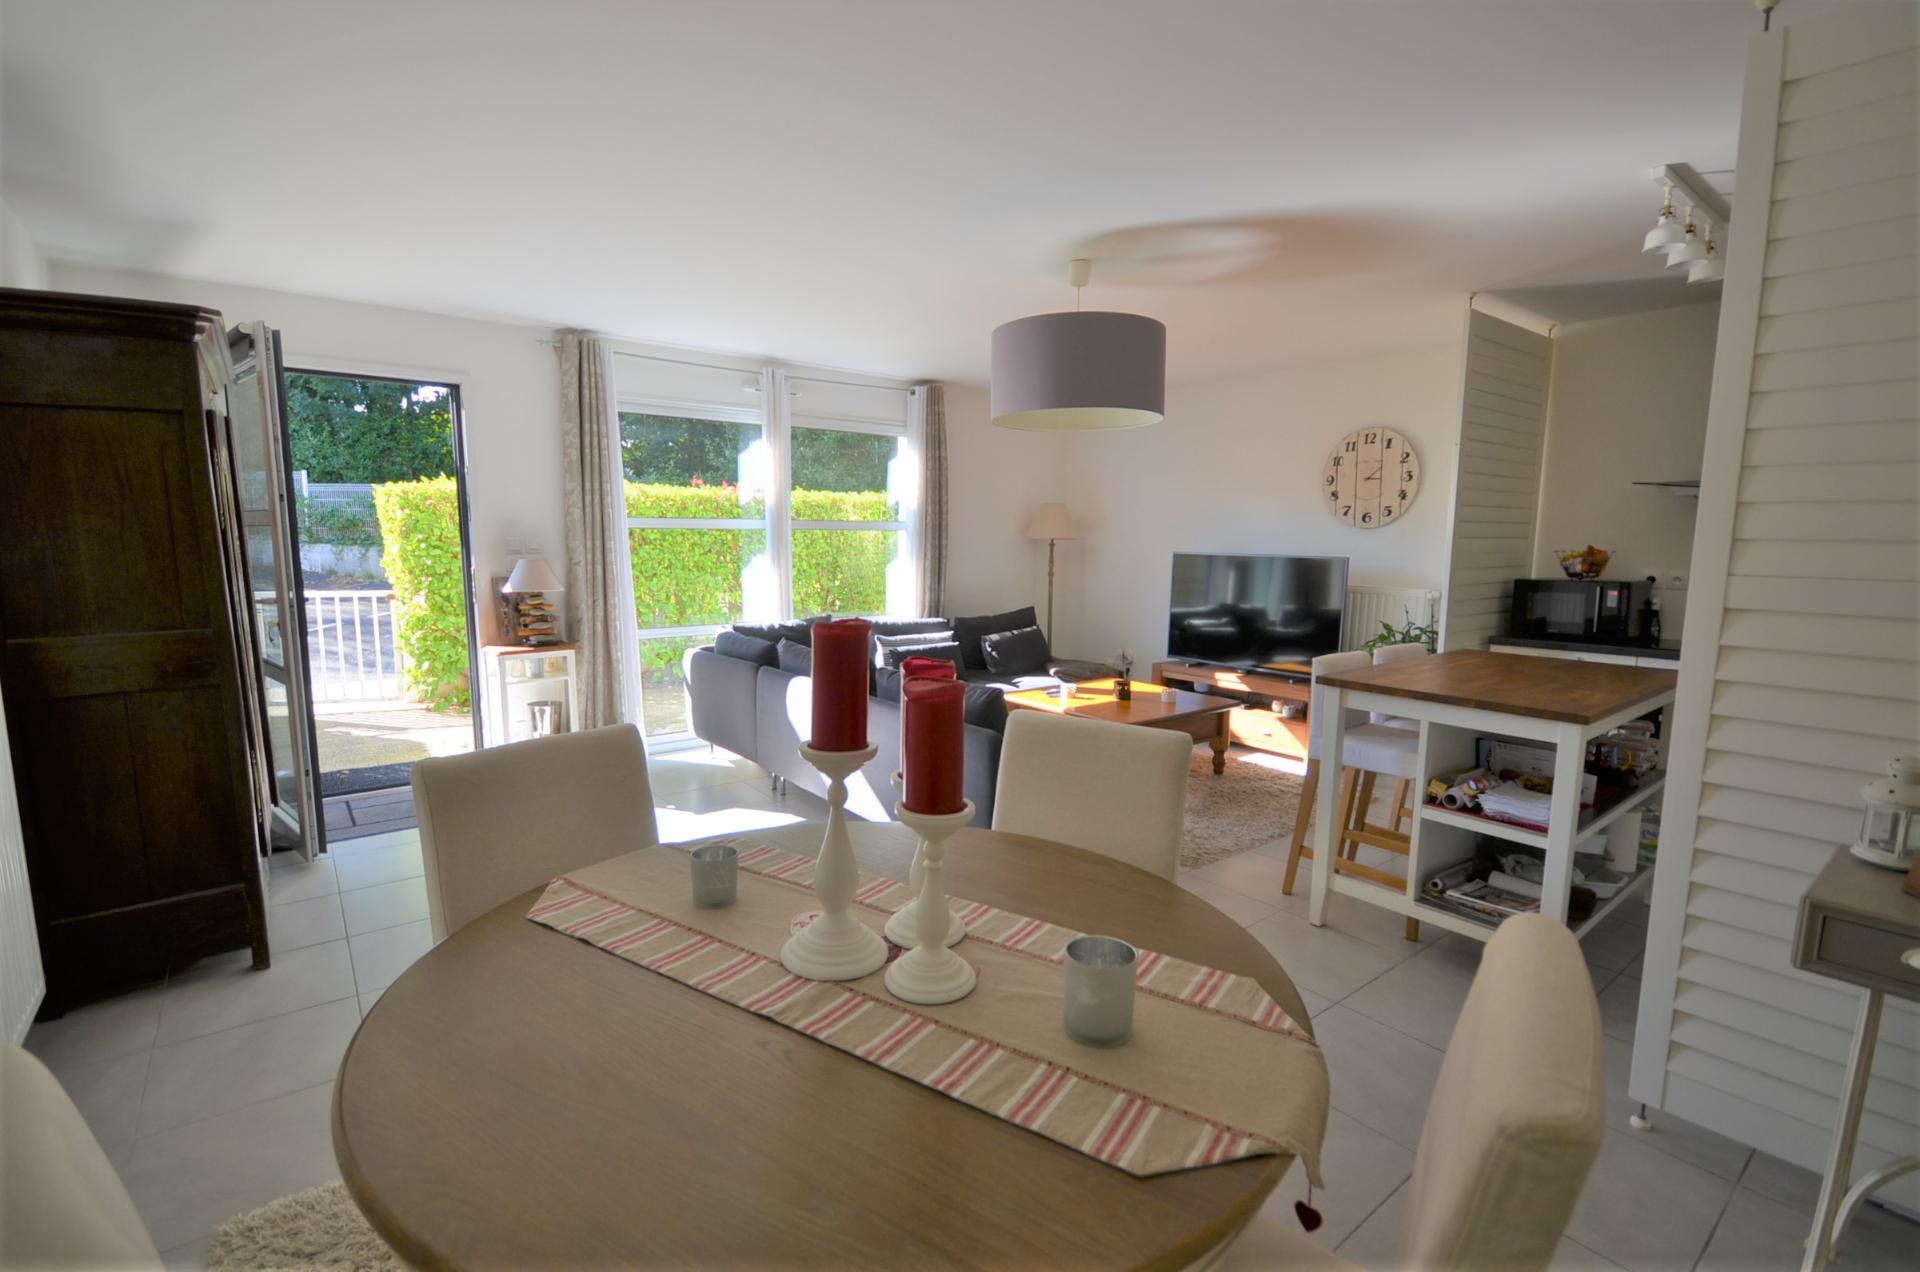 Brest - appartement récent avec vue rade, jardinet , terrasse